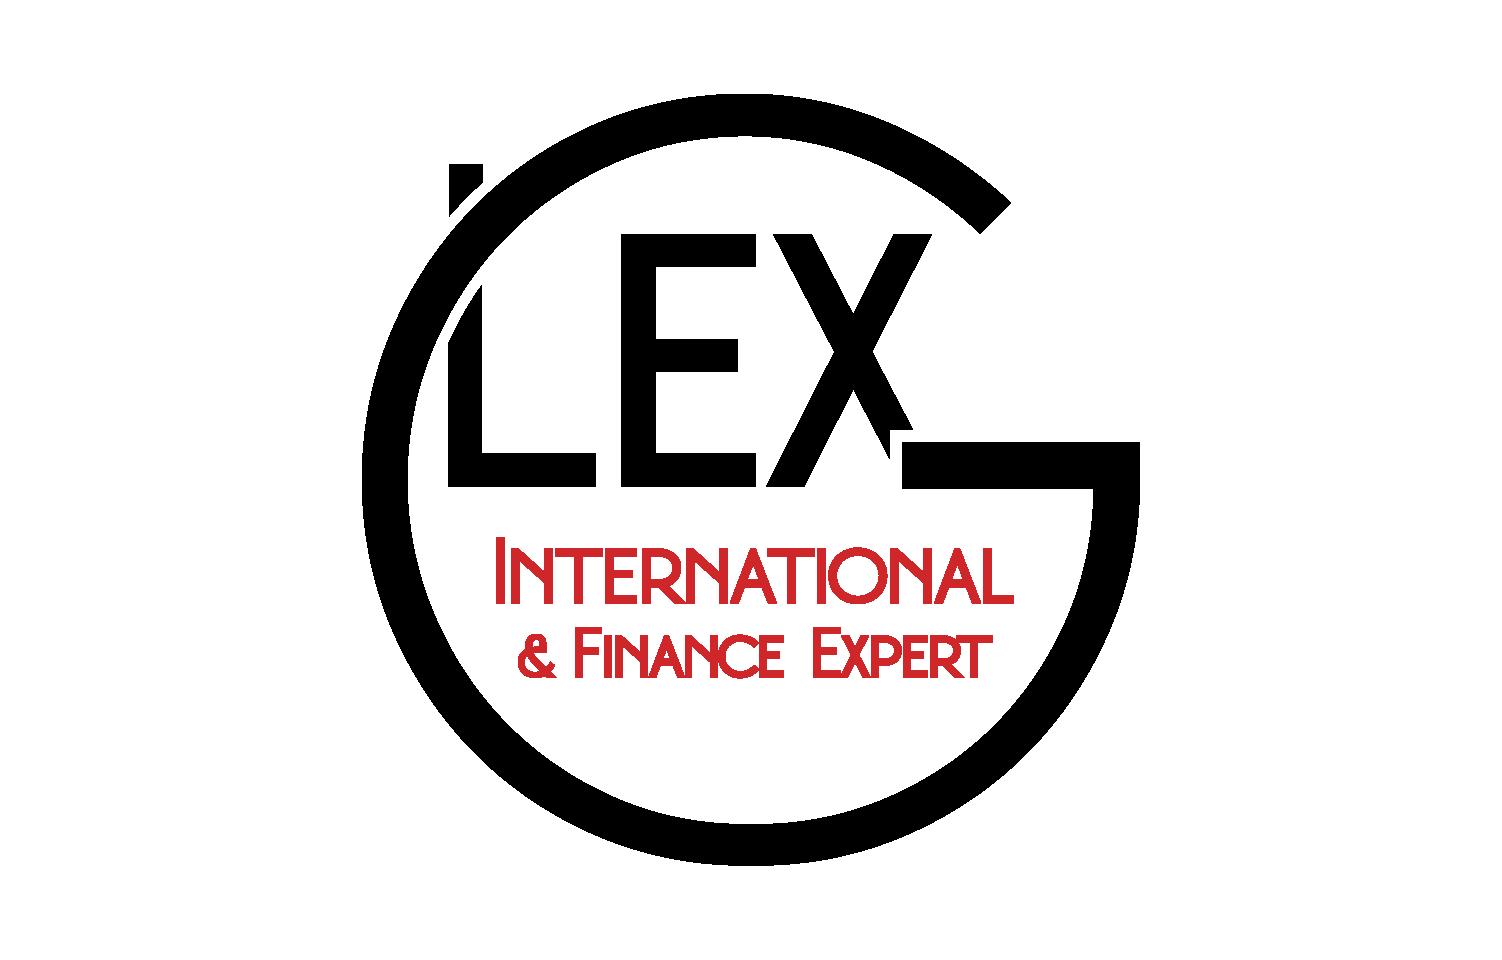 Lex International Logotipo.png